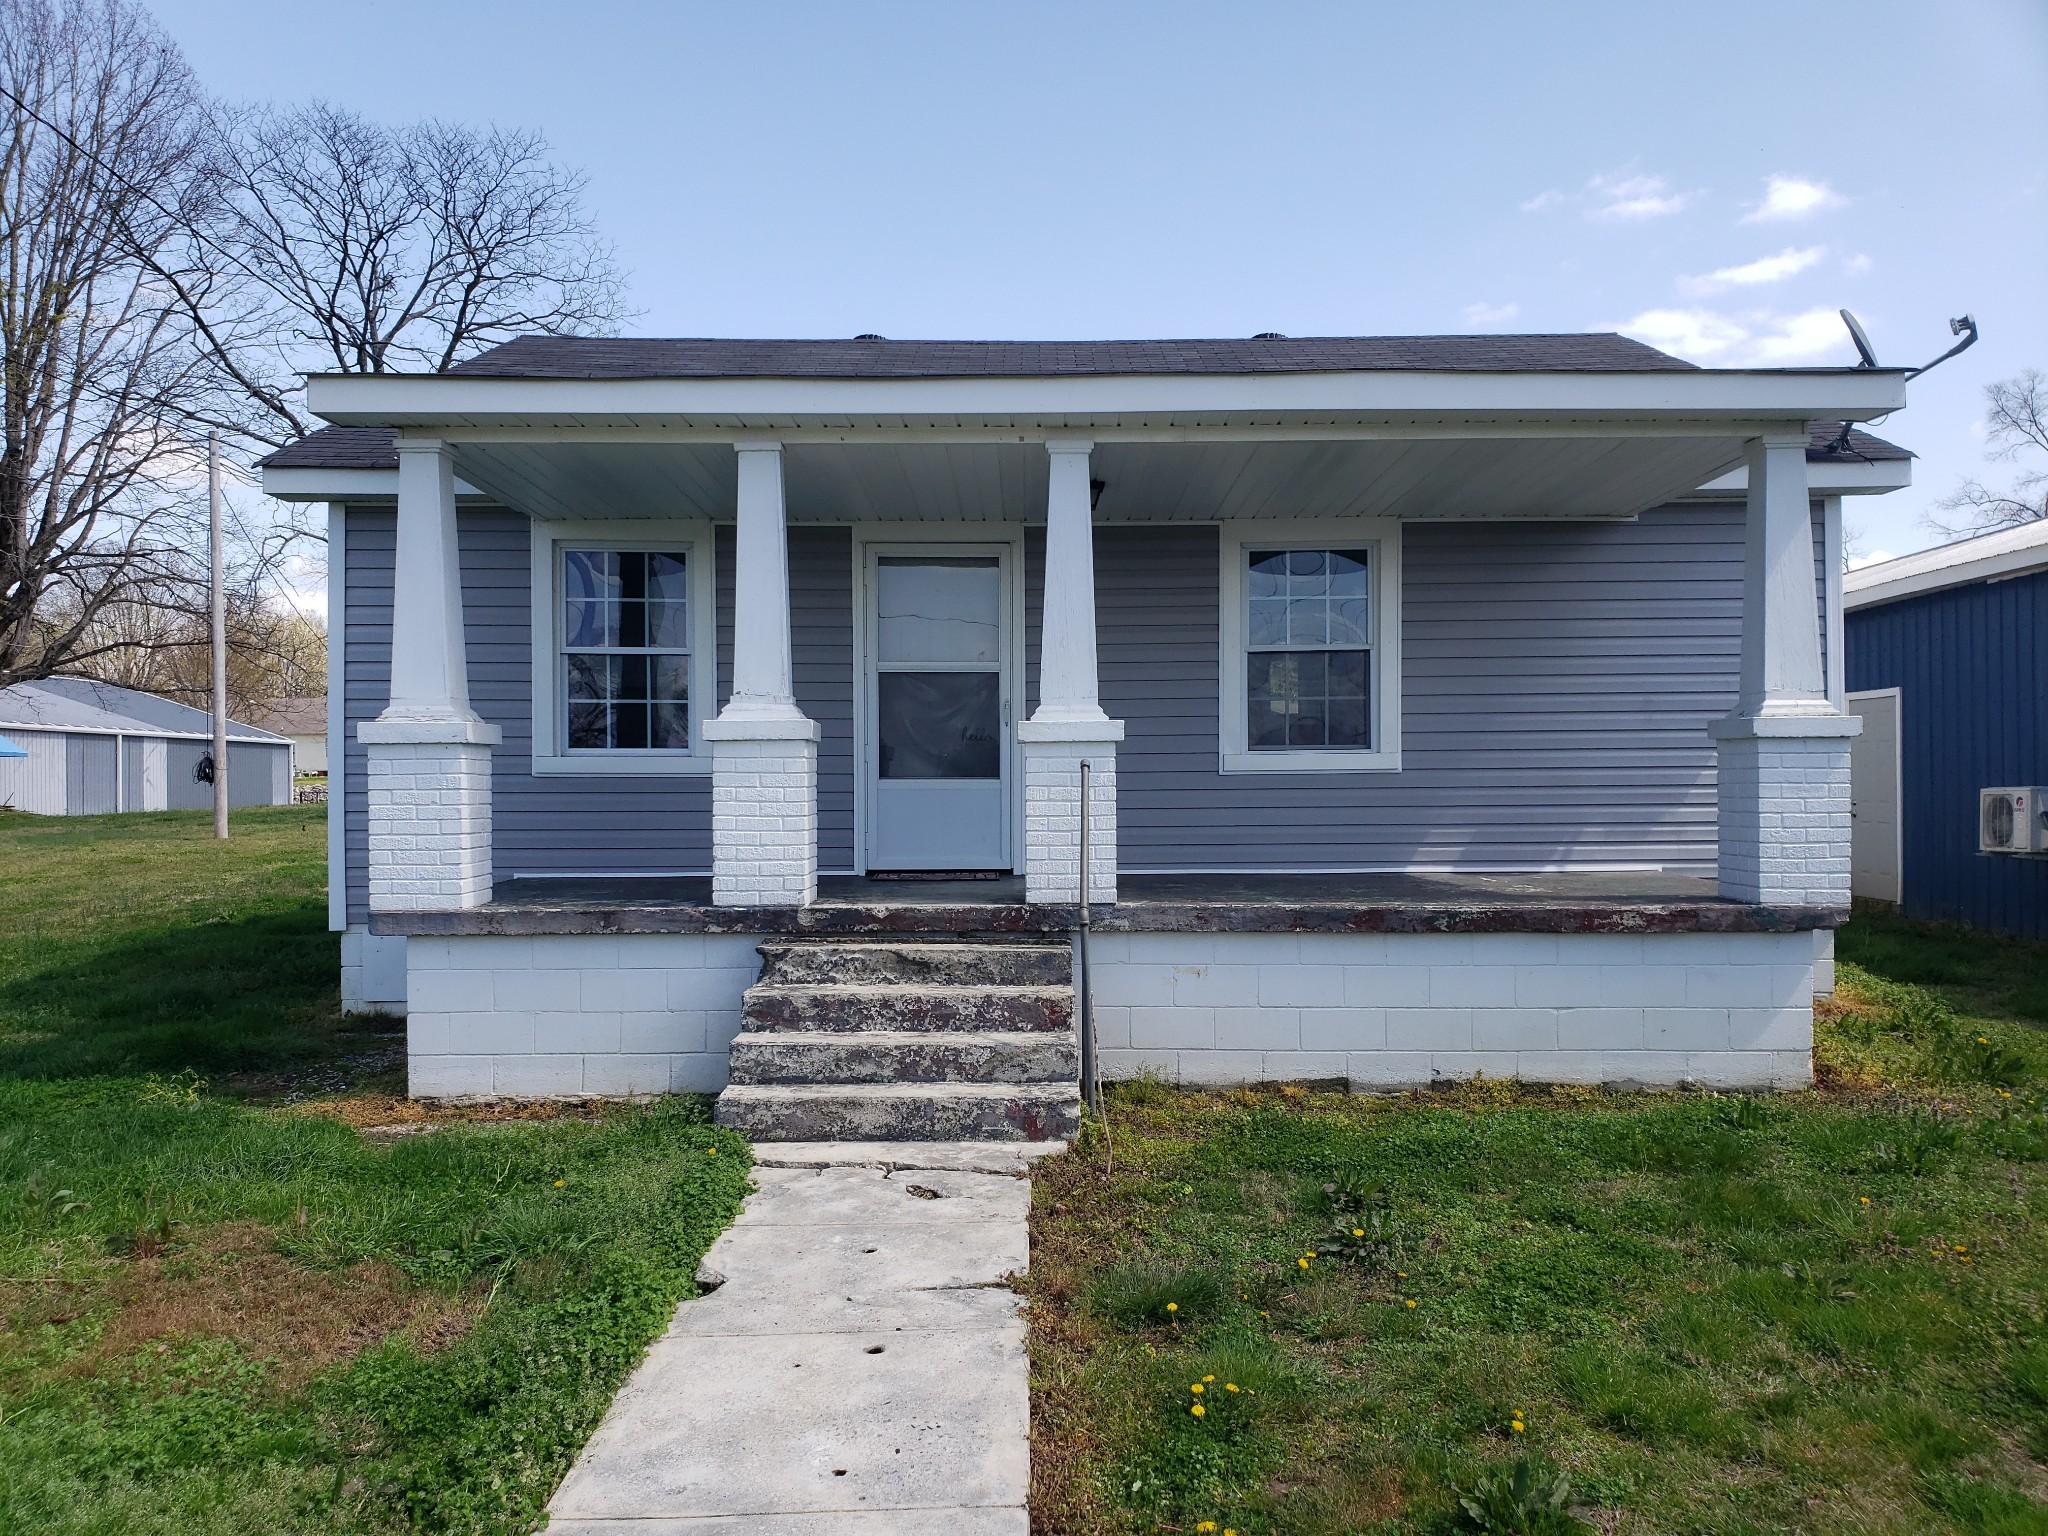 30100 E Railroad St Property Photo - Ardmore, TN real estate listing